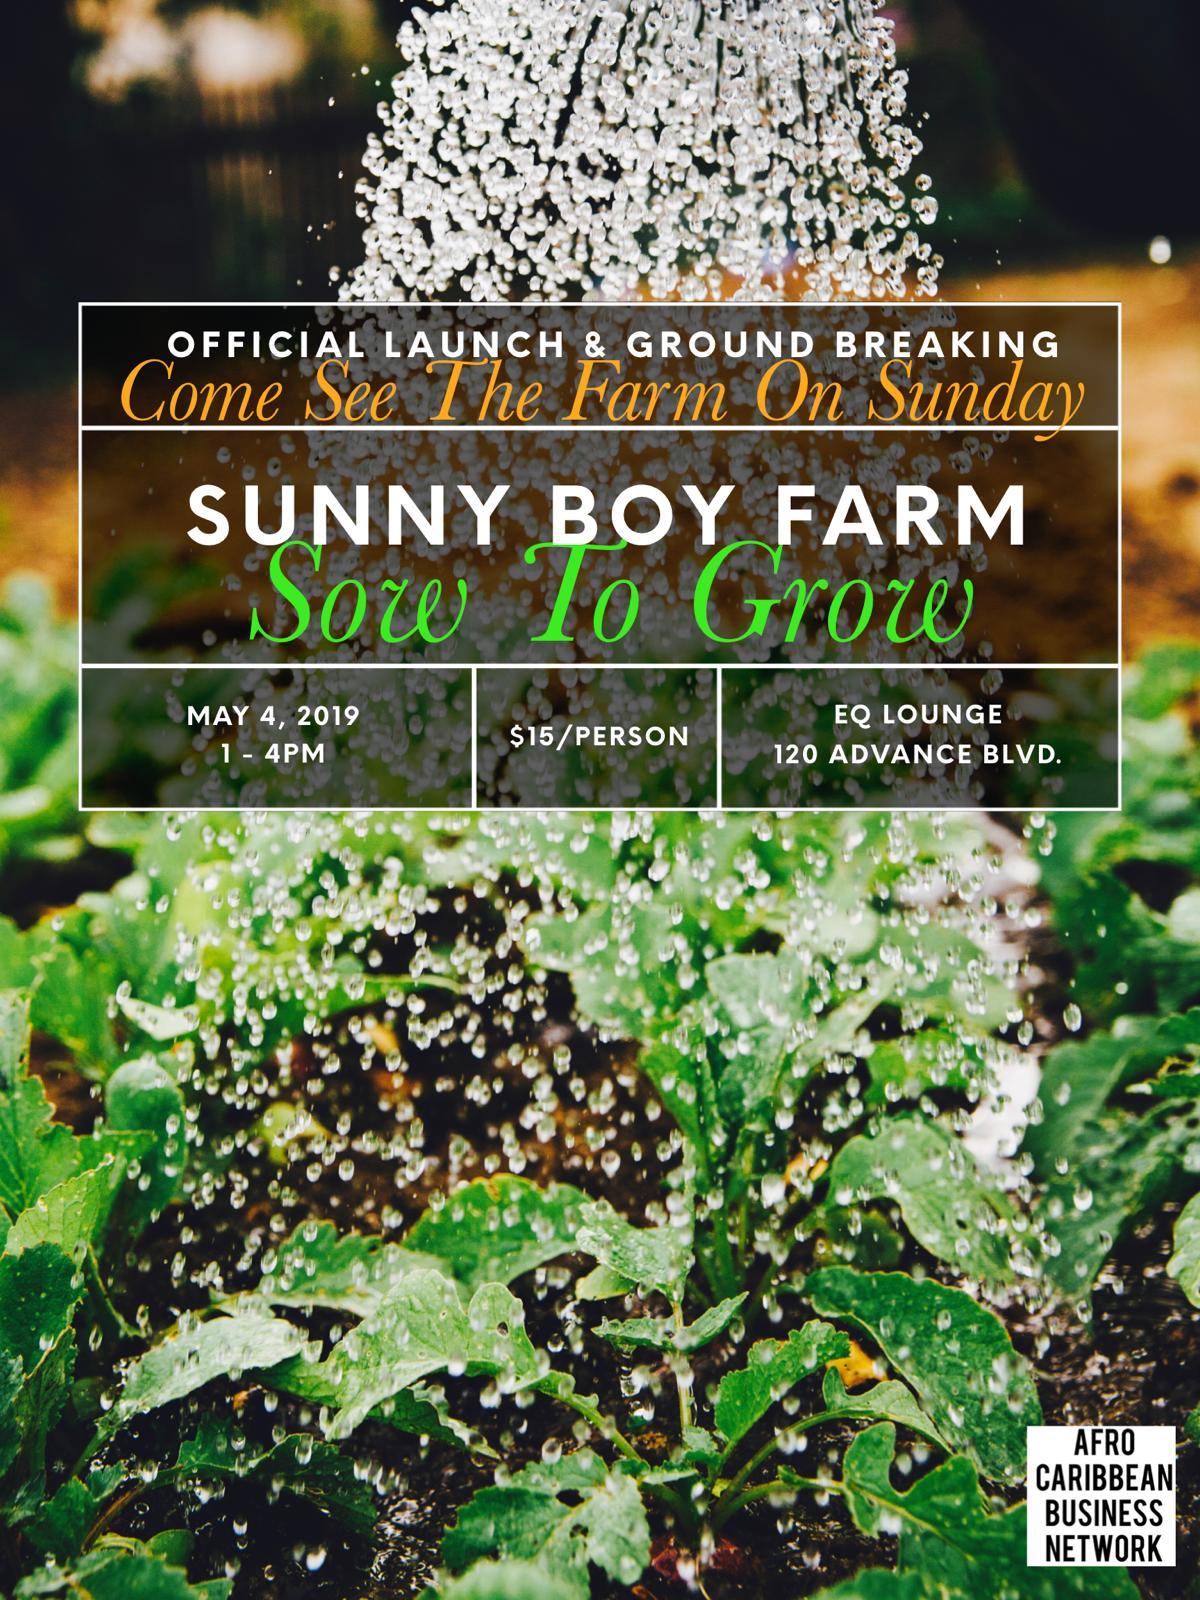 Sunny Boy Farm Launch Invitation